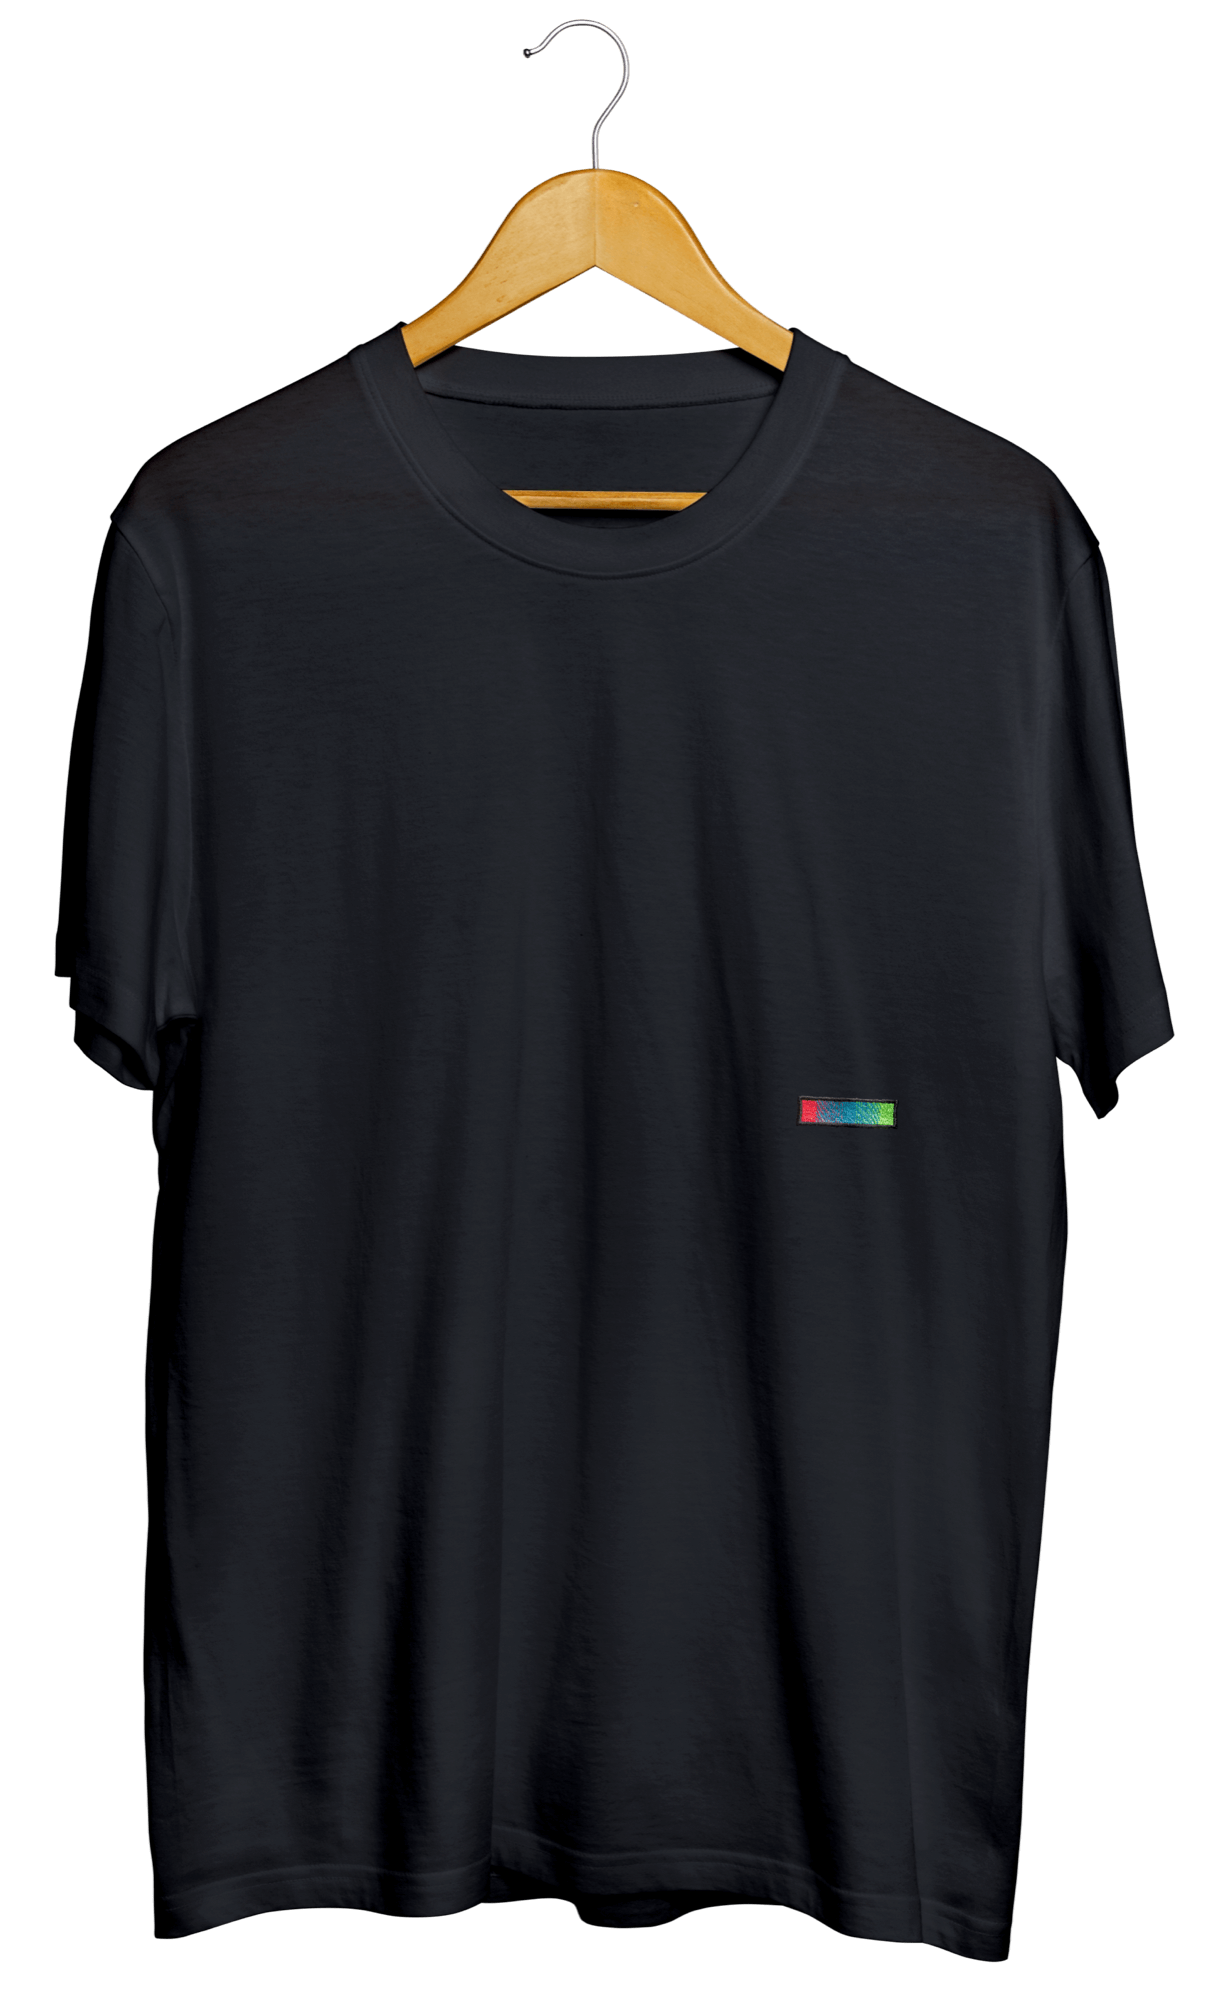 T-Shirt-Mock-Up-Front1